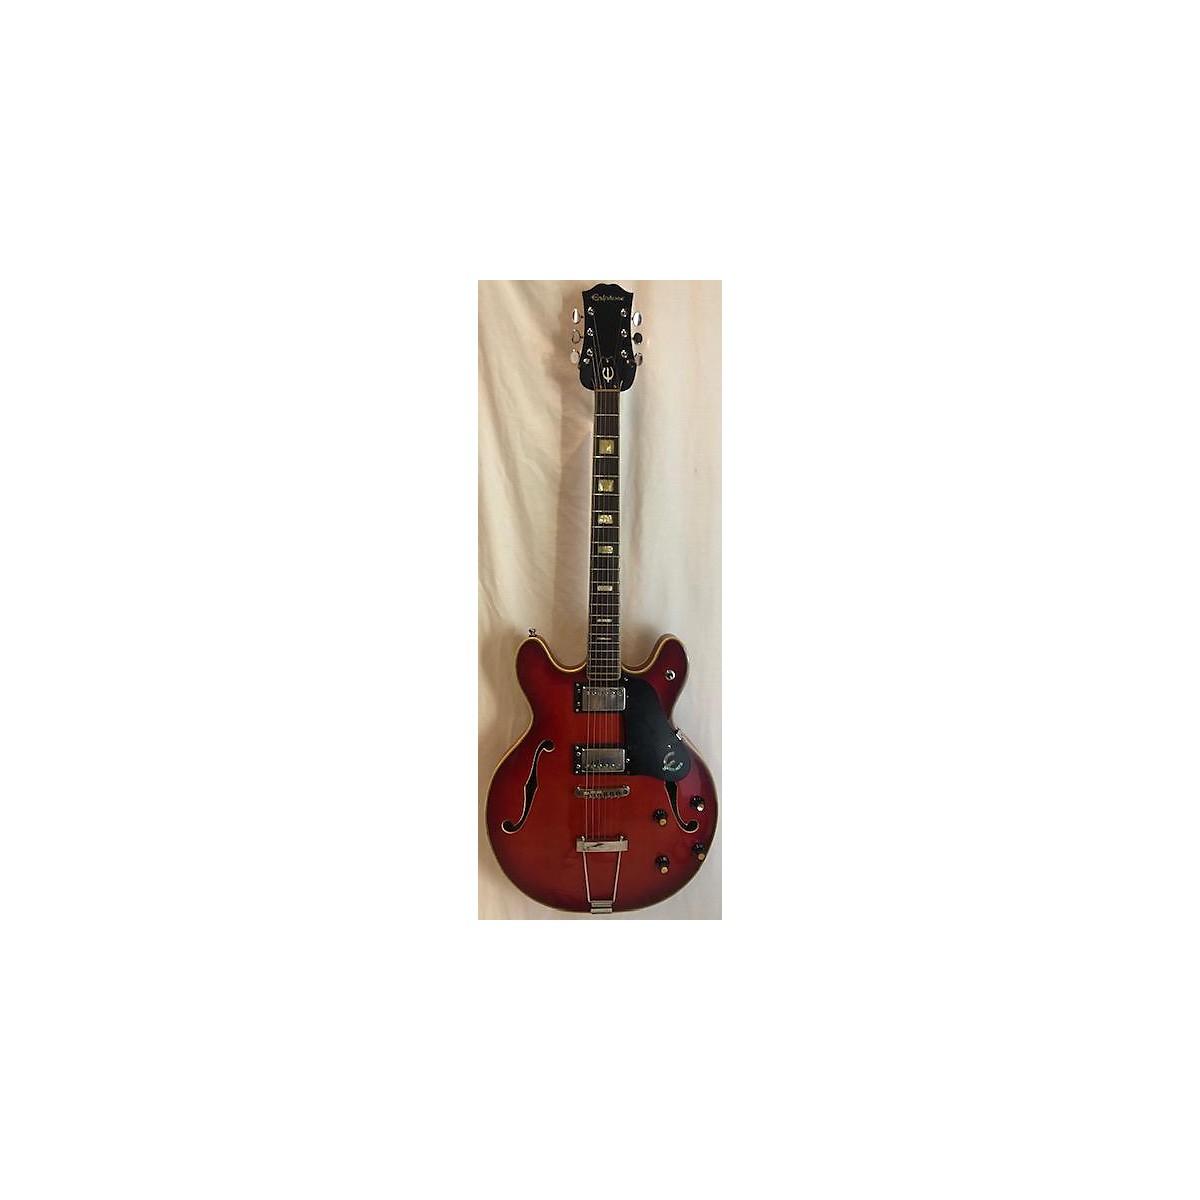 Epiphone FA250 Hollow Body Electric Guitar